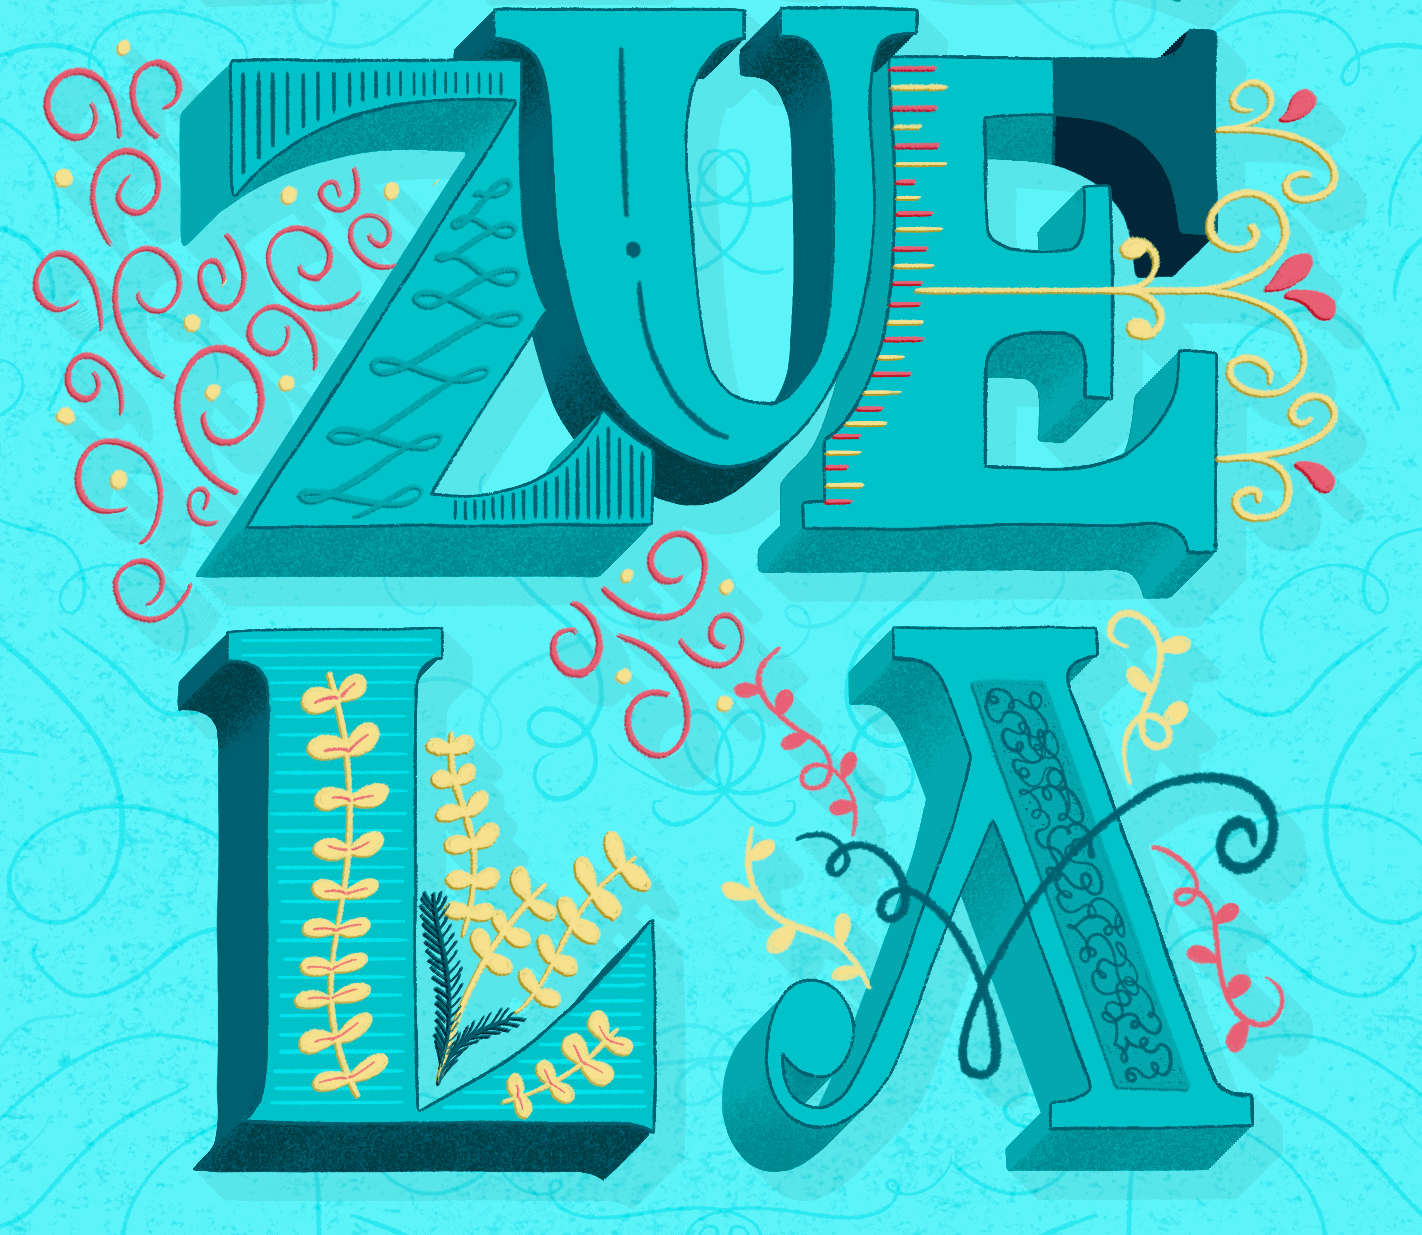 Venezuela-art-lettering-ibelis-garzon-details2